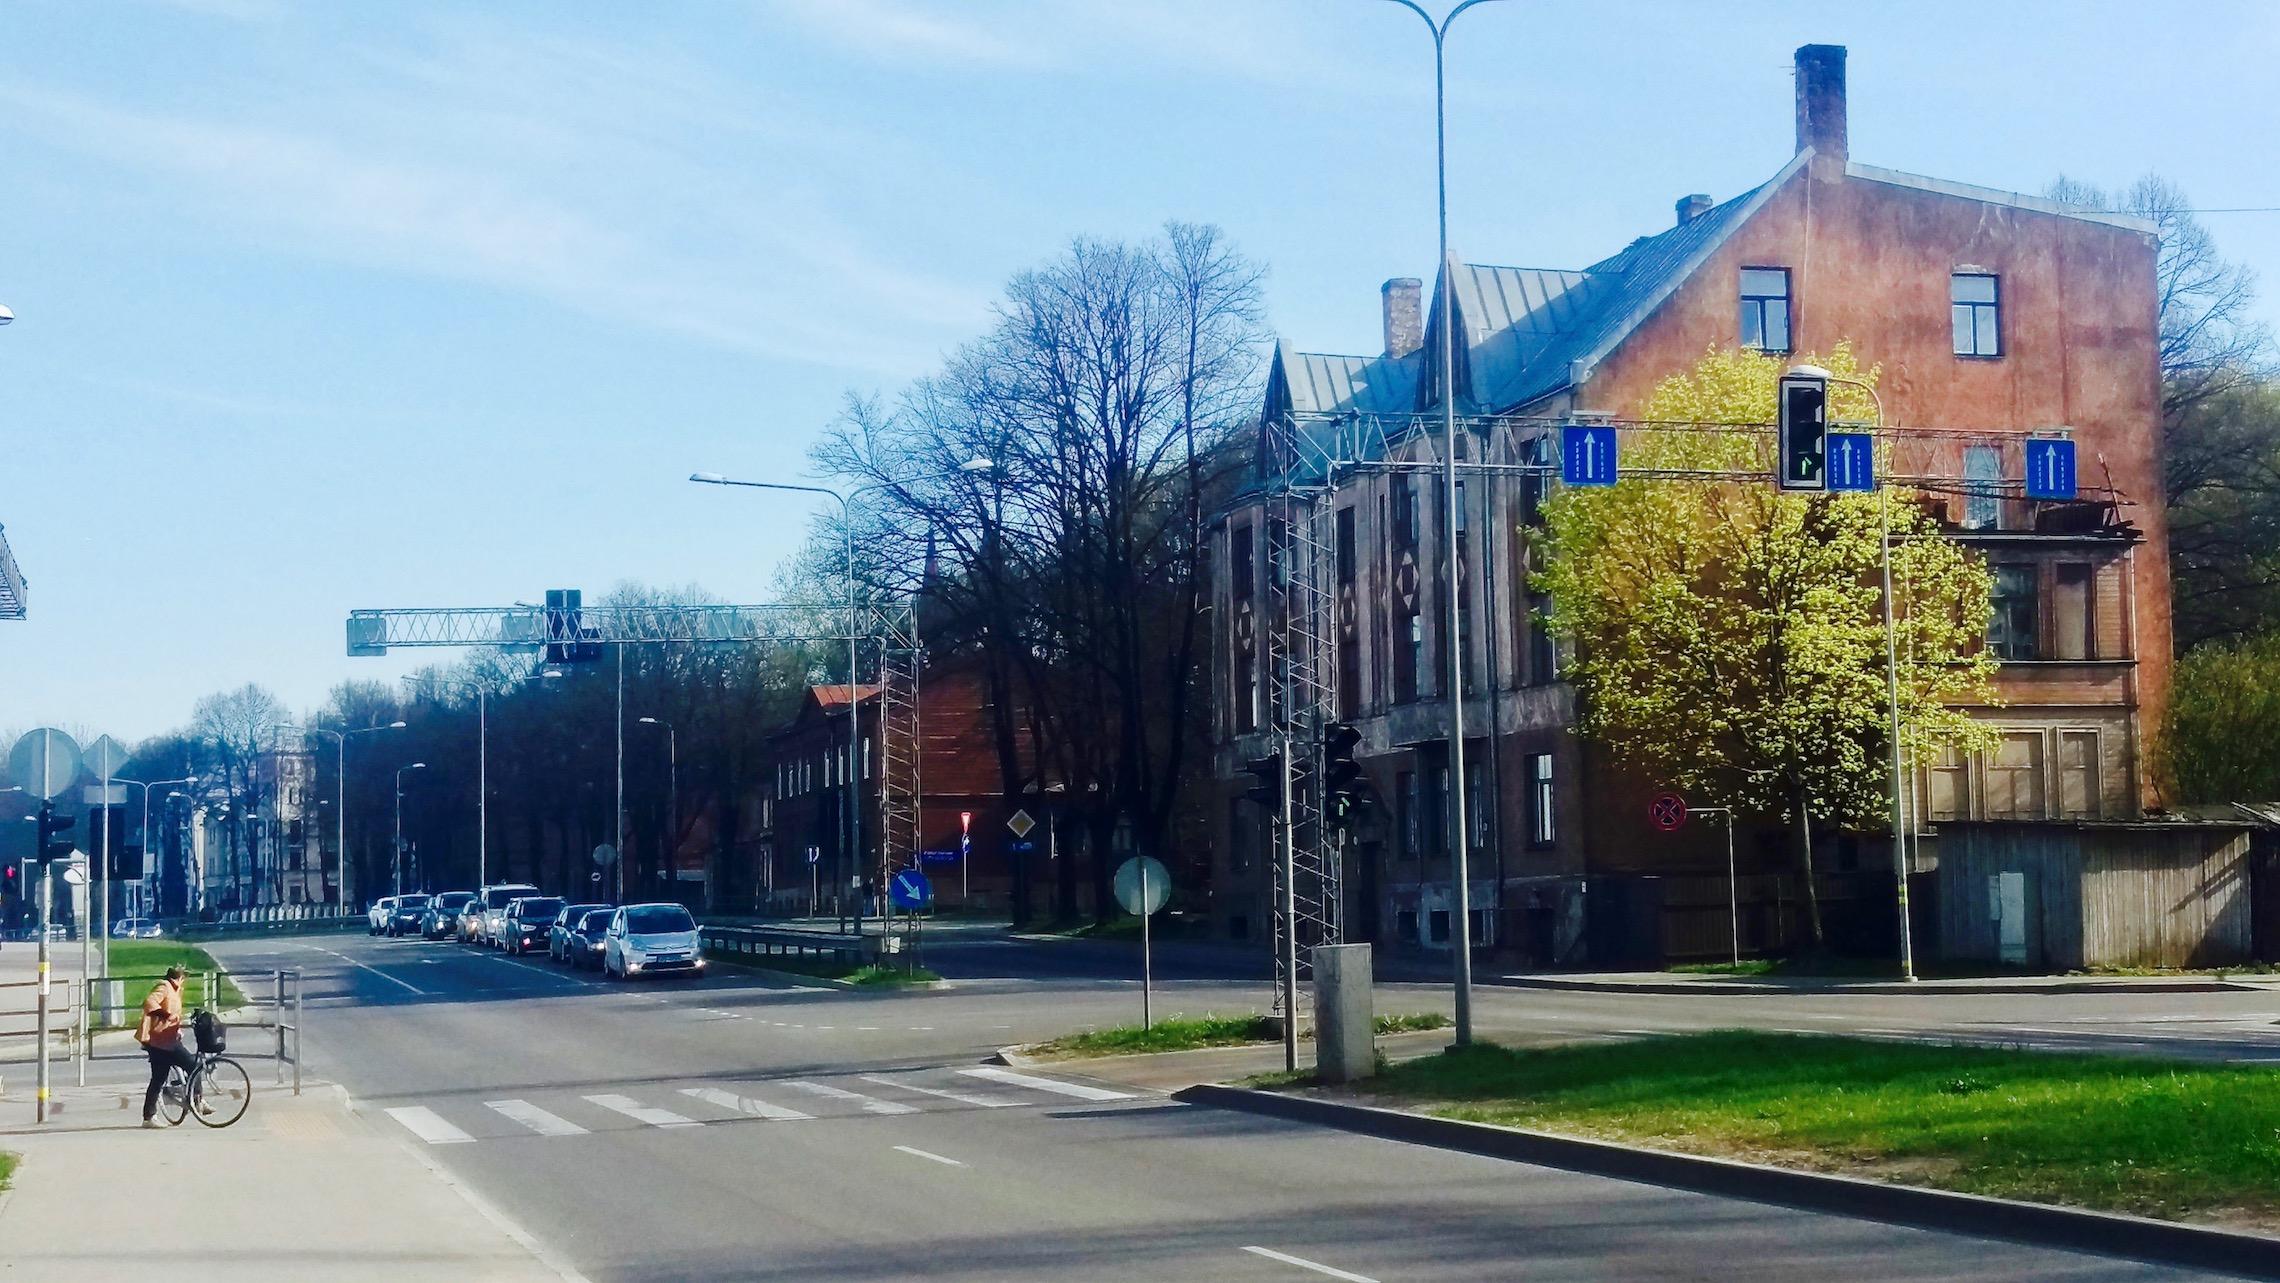 Dzirciems is up and coming neighborhood